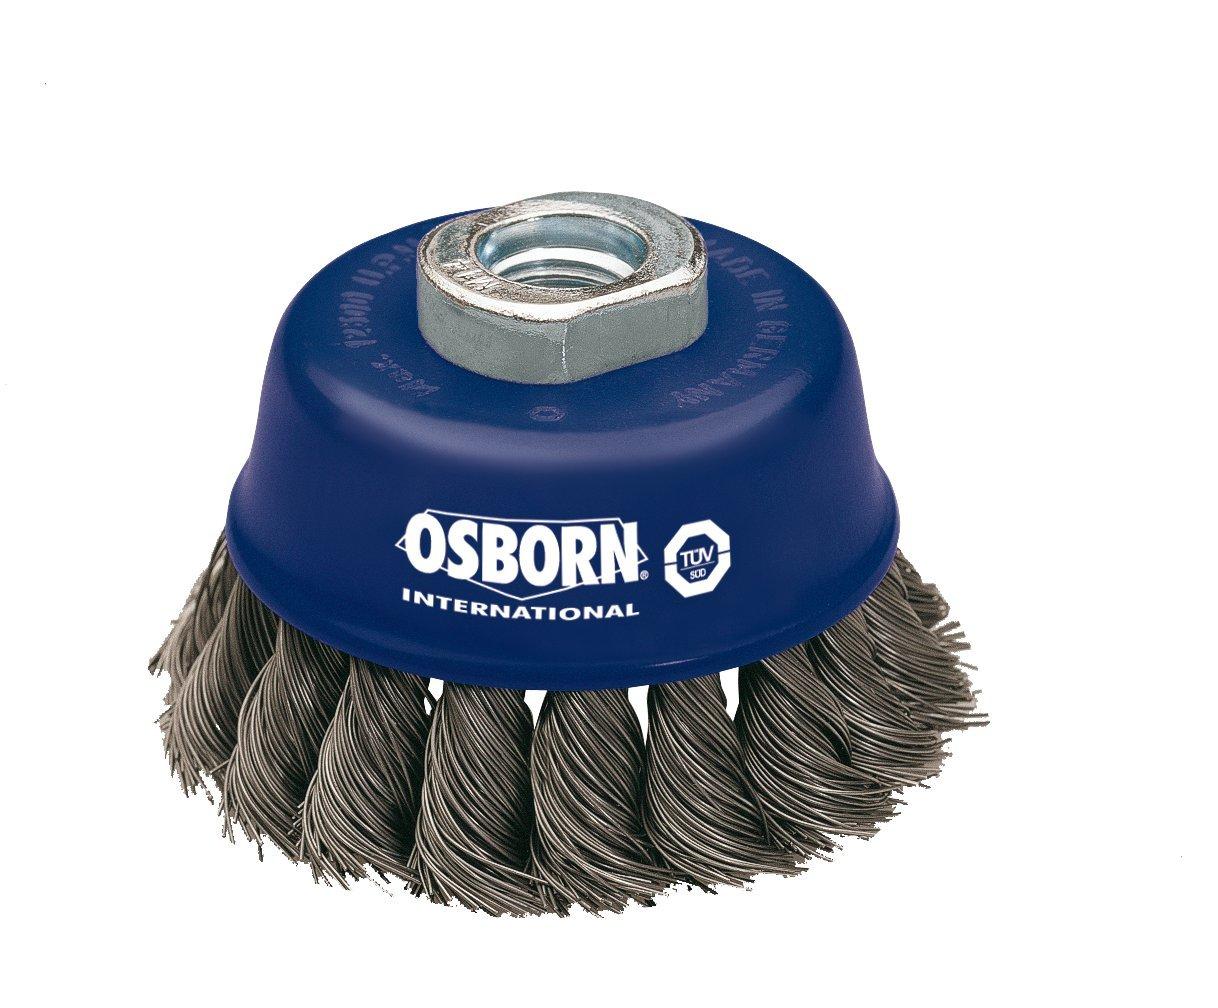 Osborn 2608151 Brosse boisseau pour meuleuse d'angle 115mm Diamètre 65mm Filetage M 14x 2 Fil d'acier ondulé de 0, 50mm Certifiée TÜV bleue 50mm Certifiée TÜV bleue